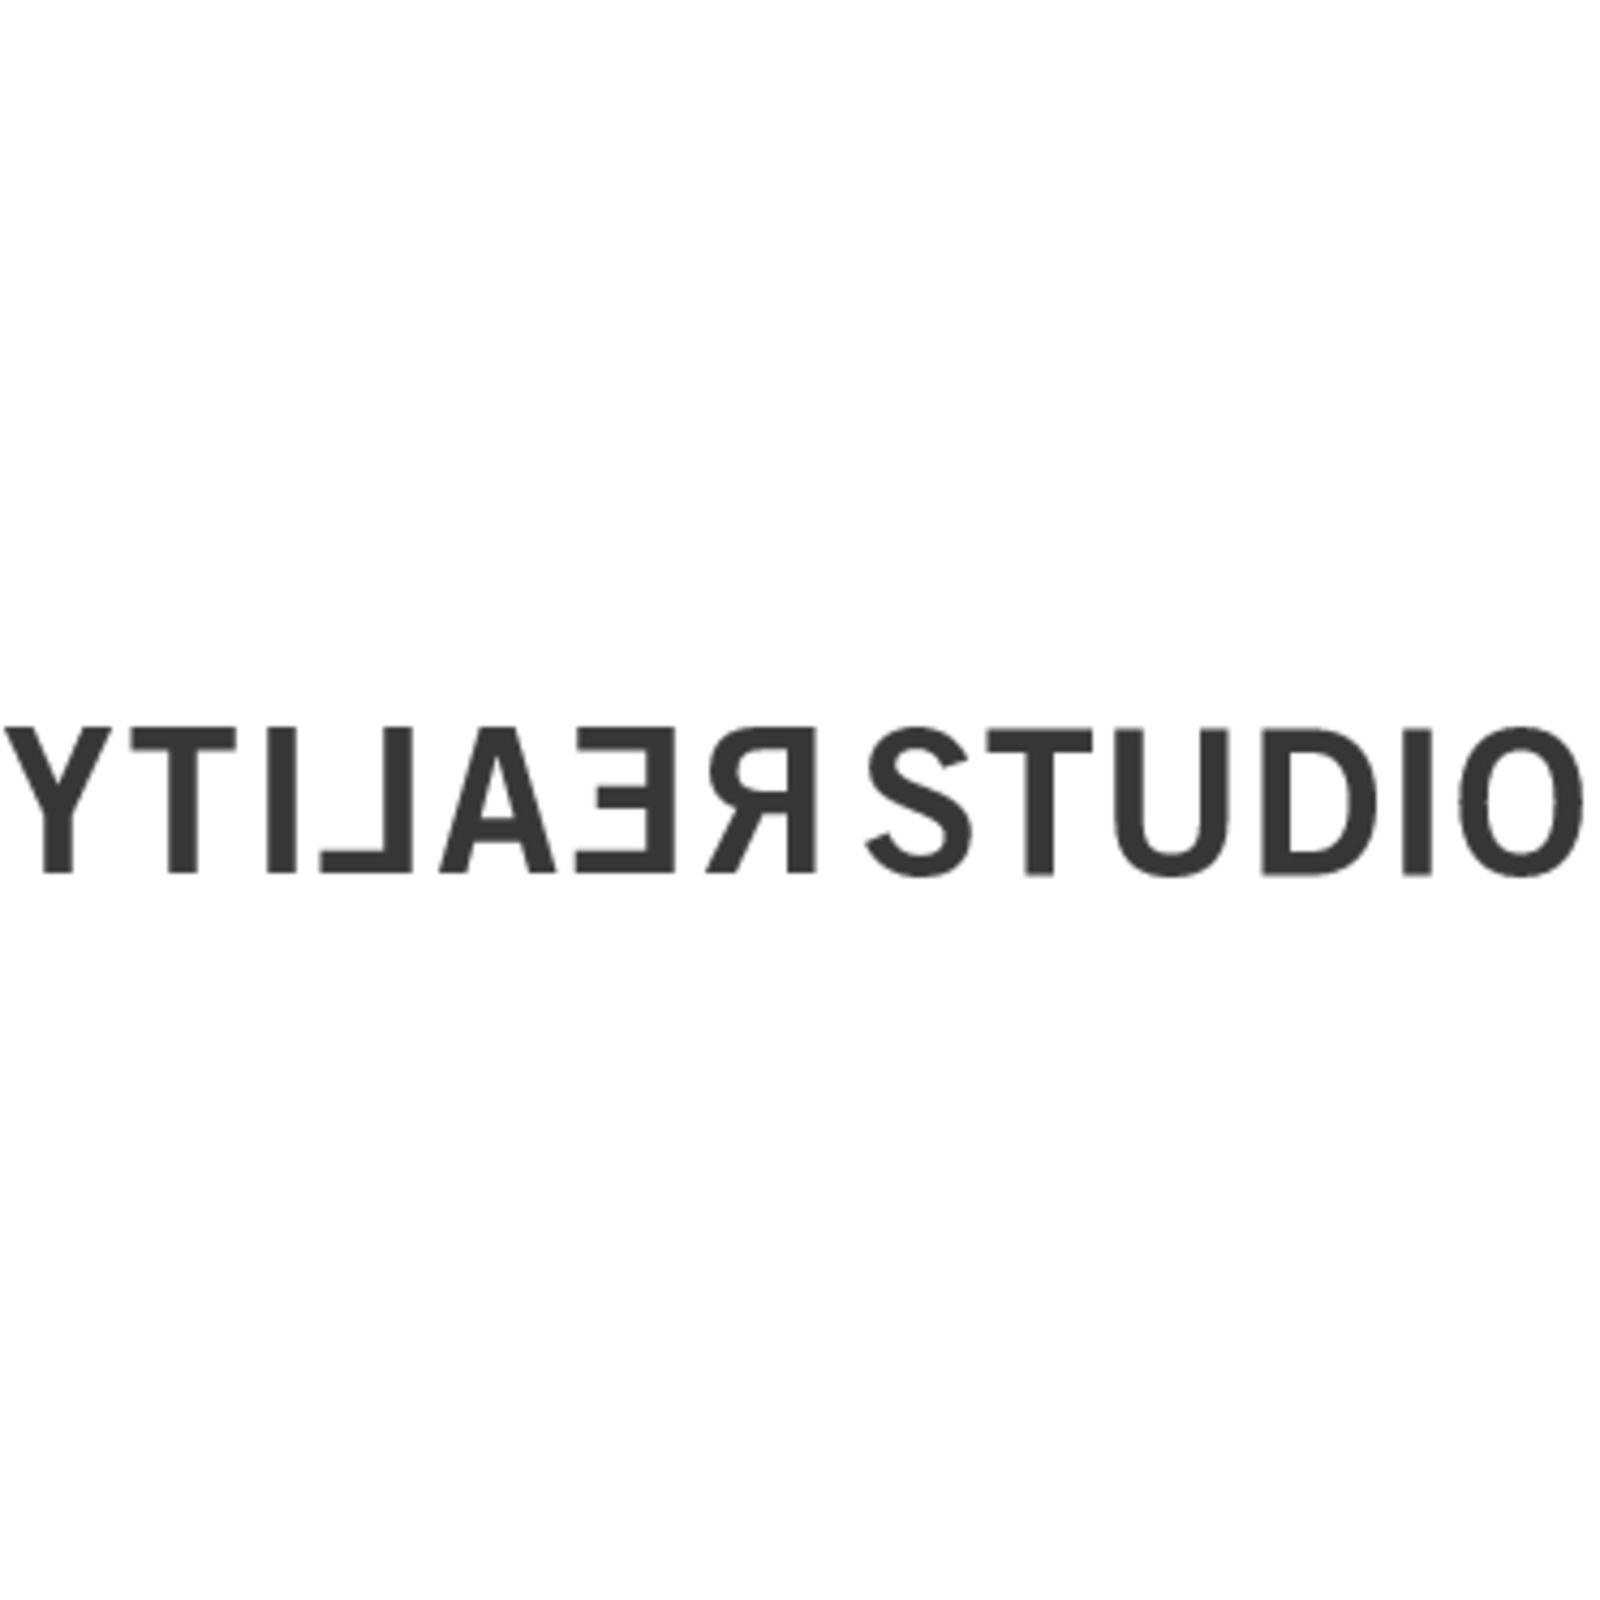 REALITY STUDIO